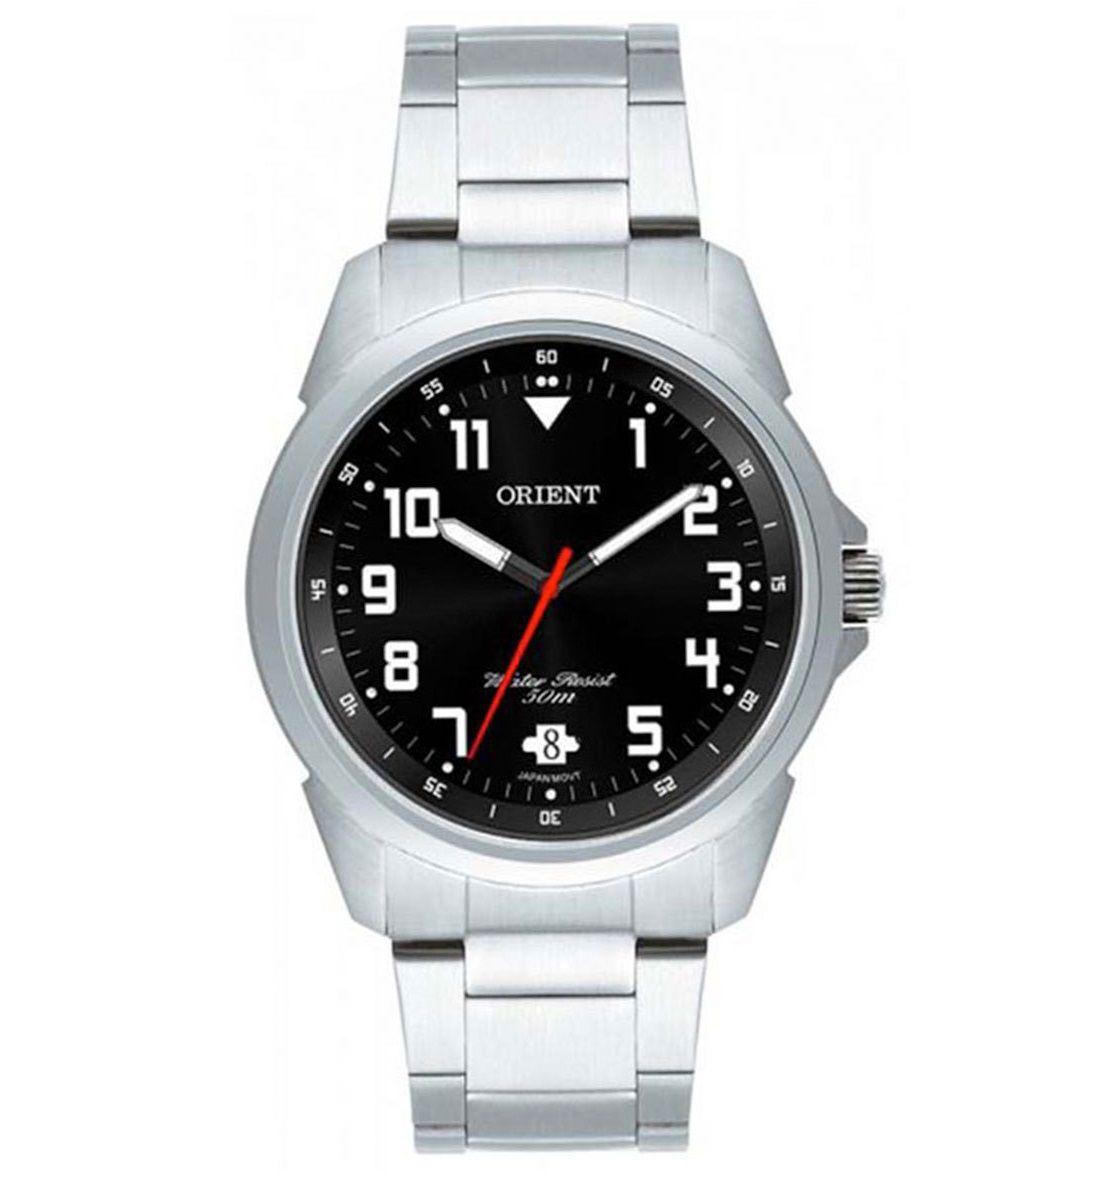 Relógio Orient Masculino Analógico Preto e Prata MBSS1154A P2SX